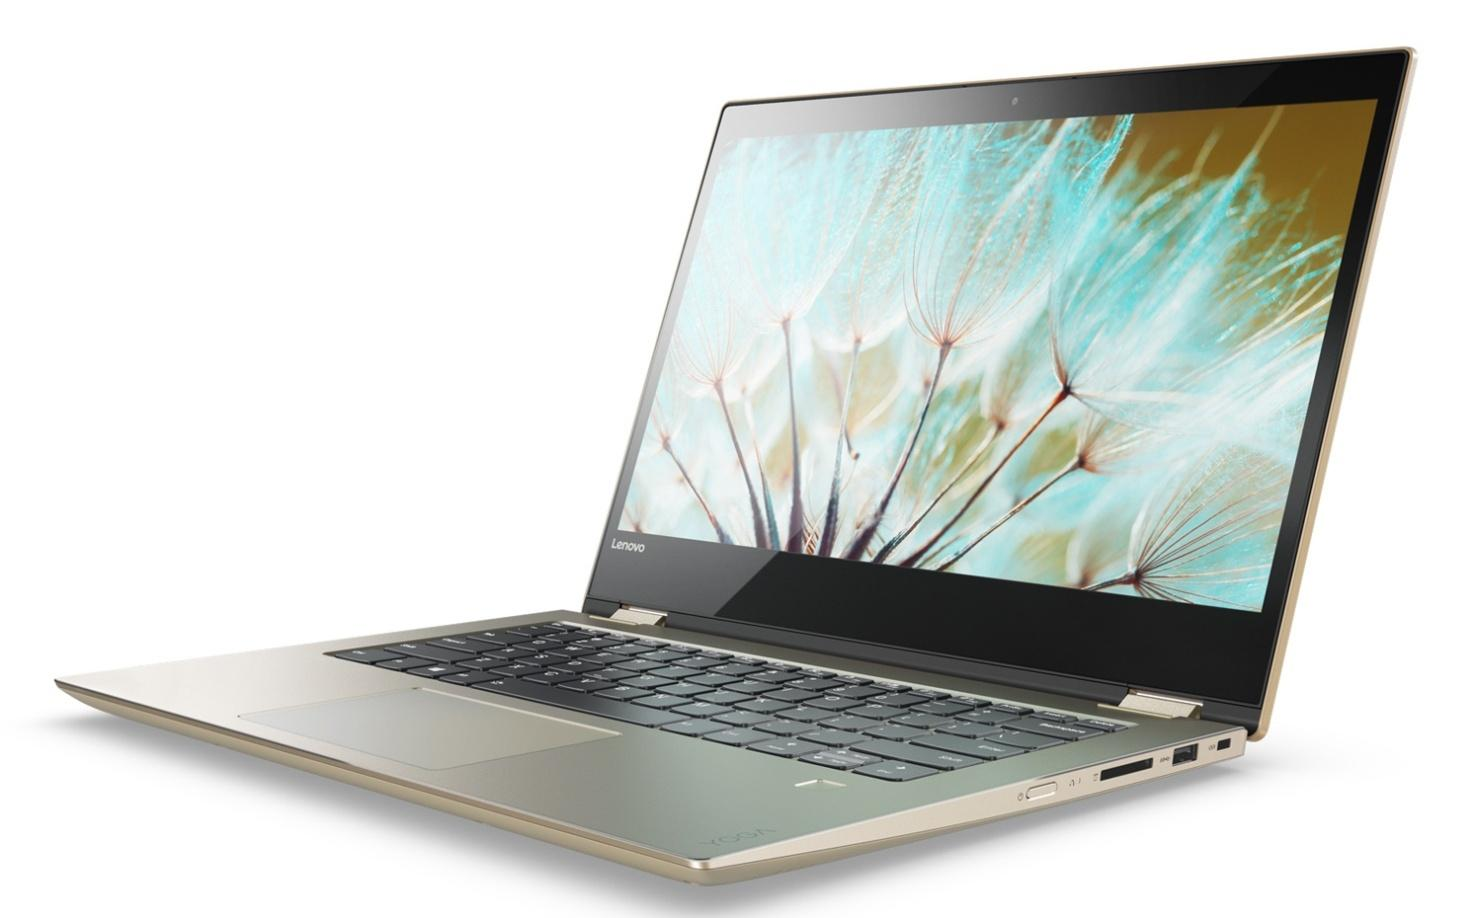 Фото 1 - Ультрабук Lenovo YOGA 520 Gold Metallic (81C800DBRA)